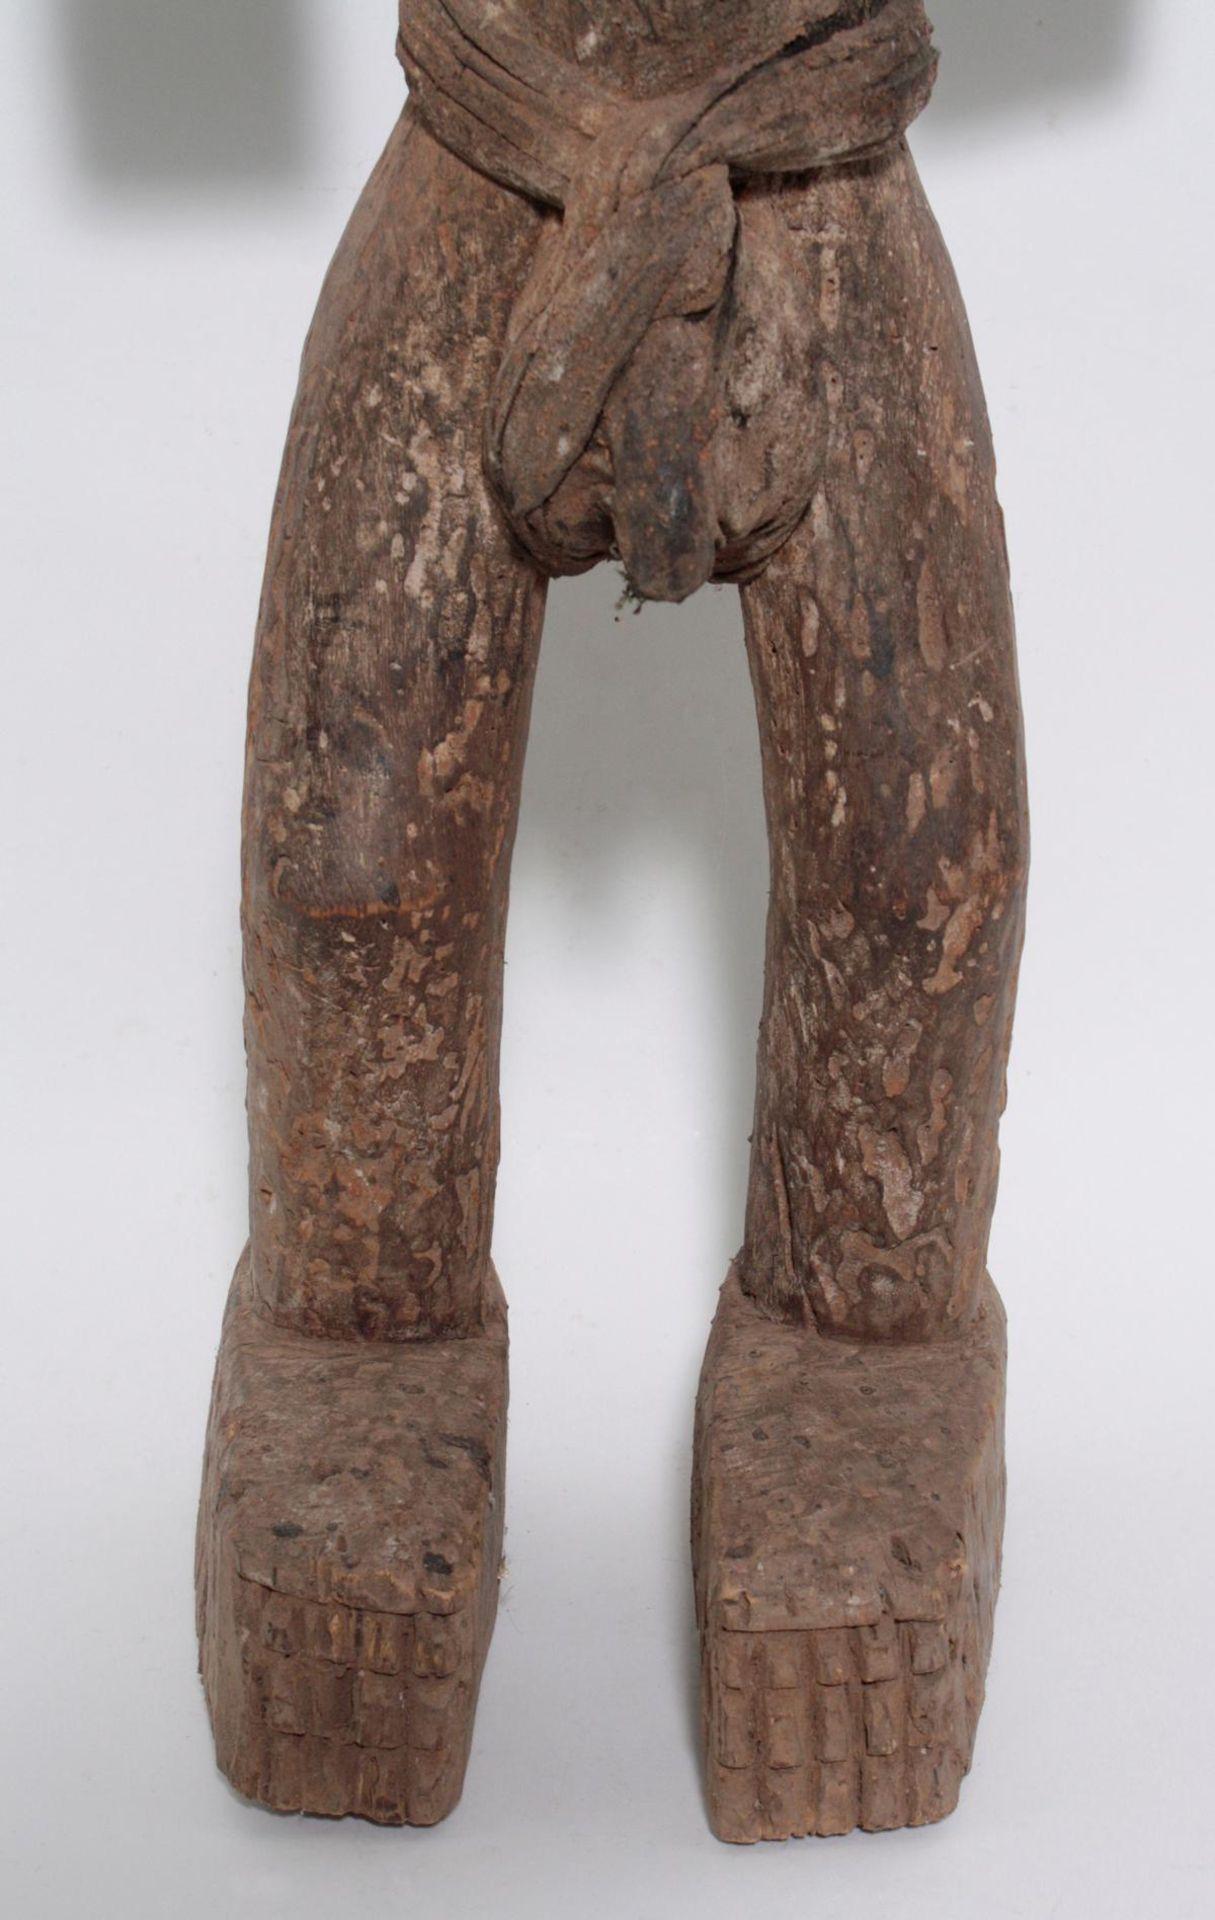 Ältere Große Figur, Dogon oder Bambara, Mali - Bild 4 aus 16